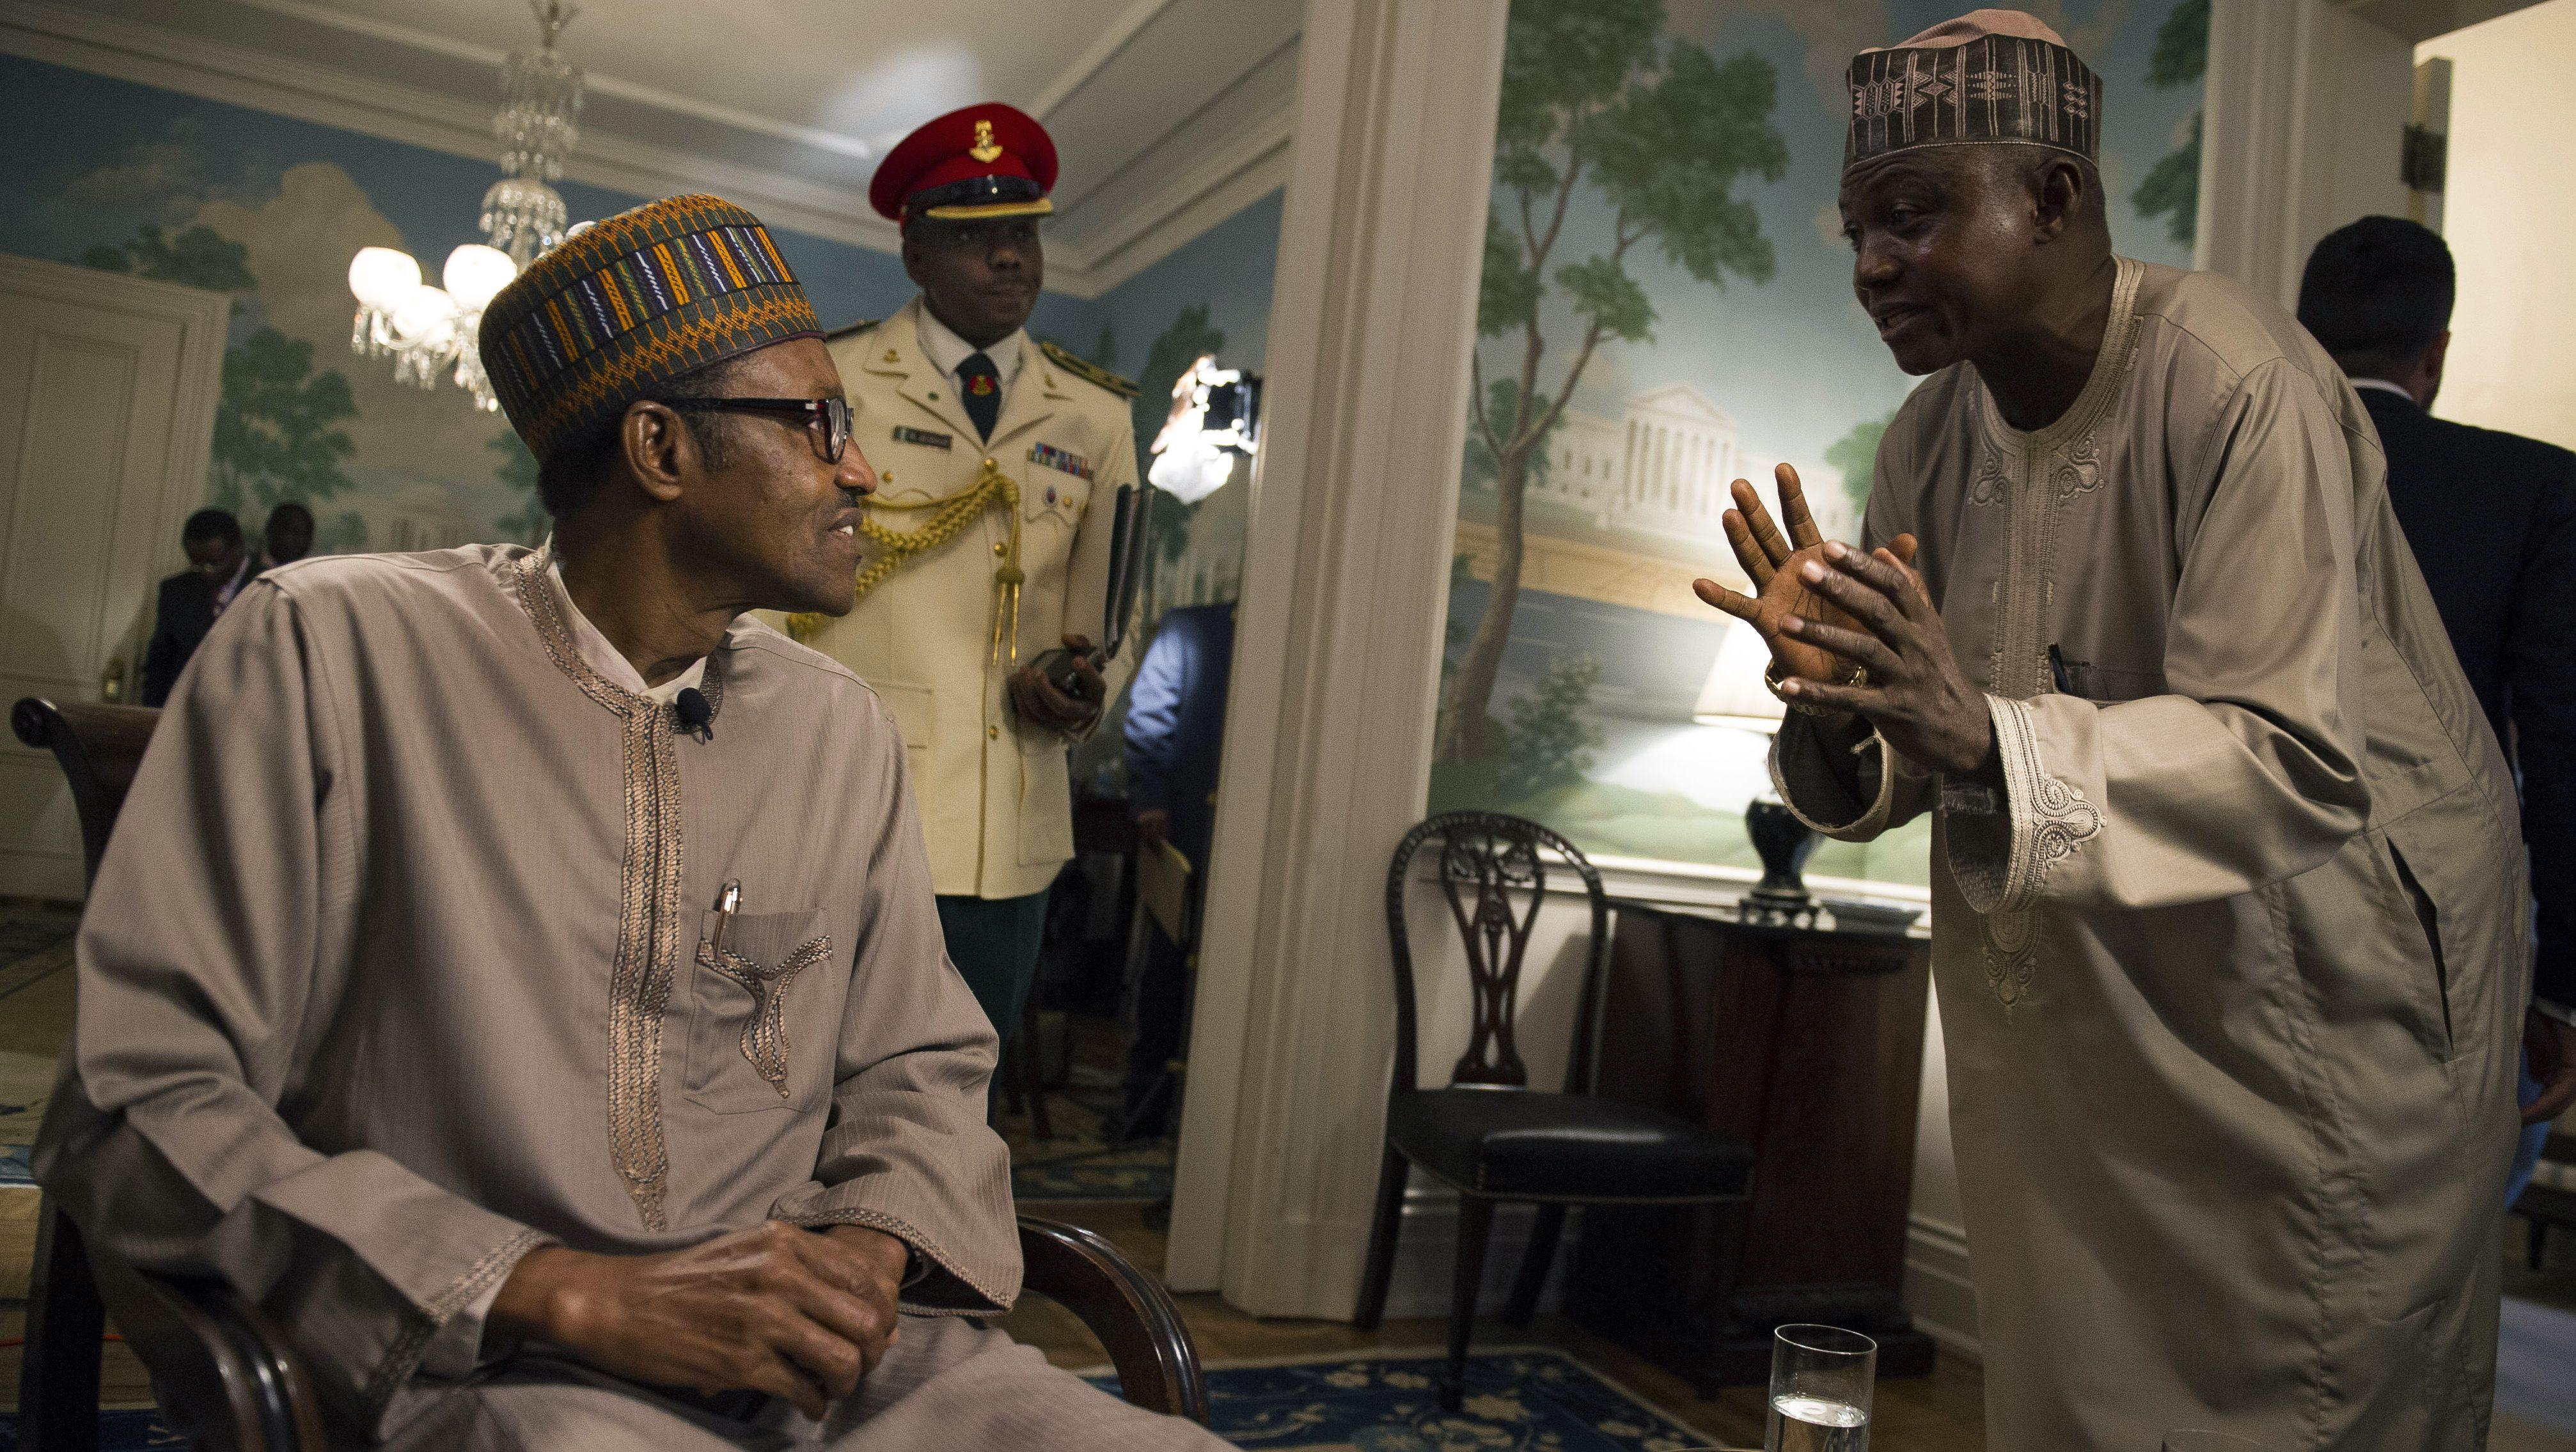 Nigerian President Muhammadu Buhari confers with advisor between news media interviews at Blair House in Washington, Tuesday, July 21, 2015. (AP Photo/Cliff Owen)